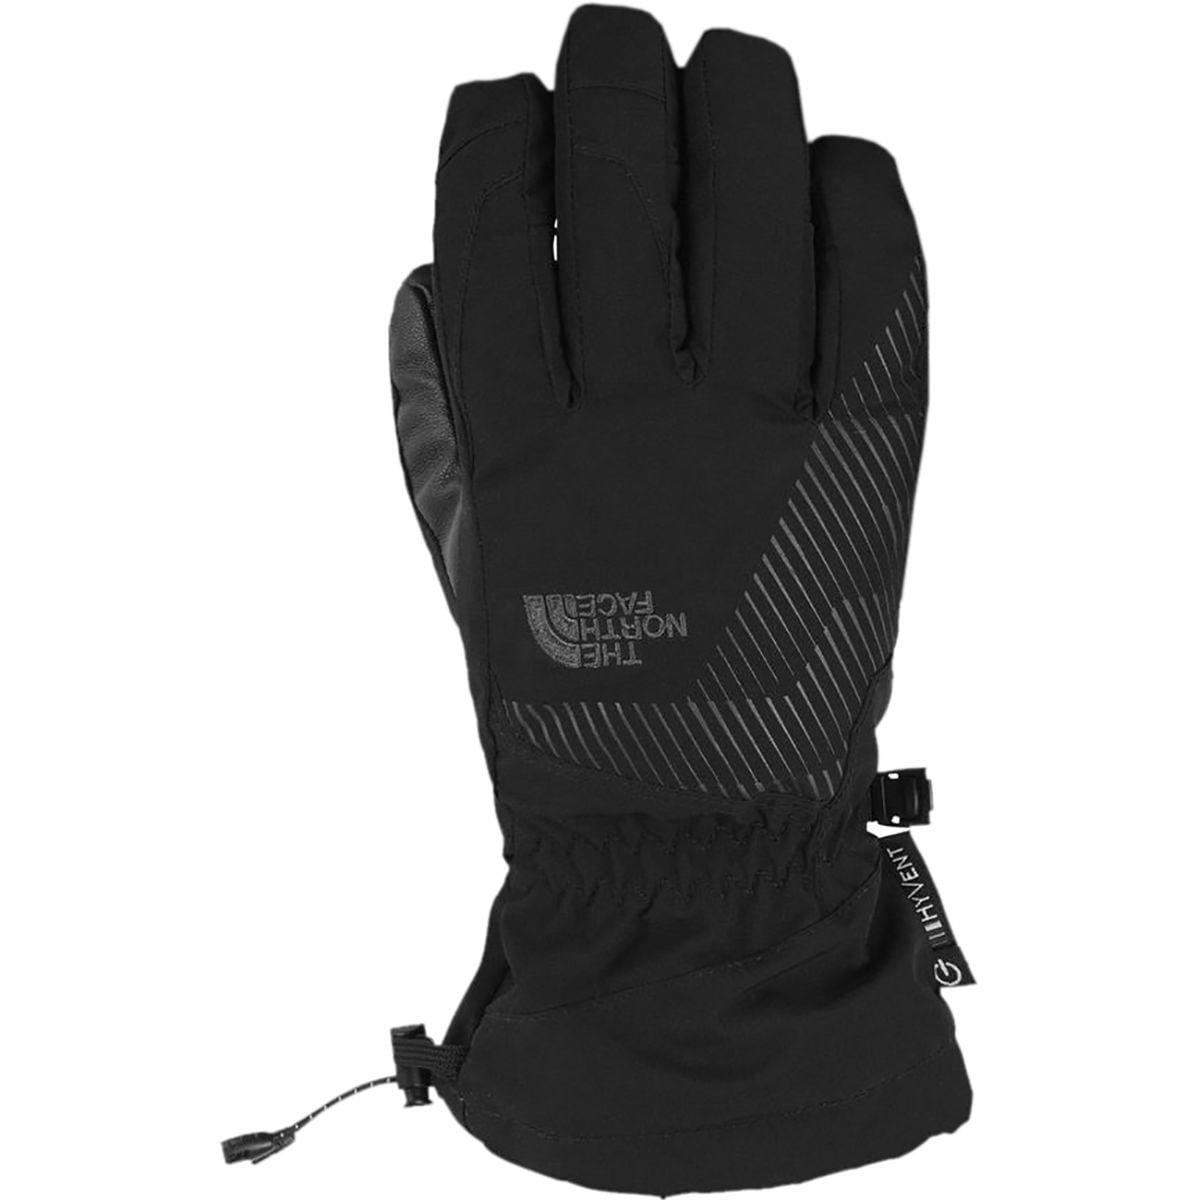 The North Face Revelstoke Etip Glove - Kids